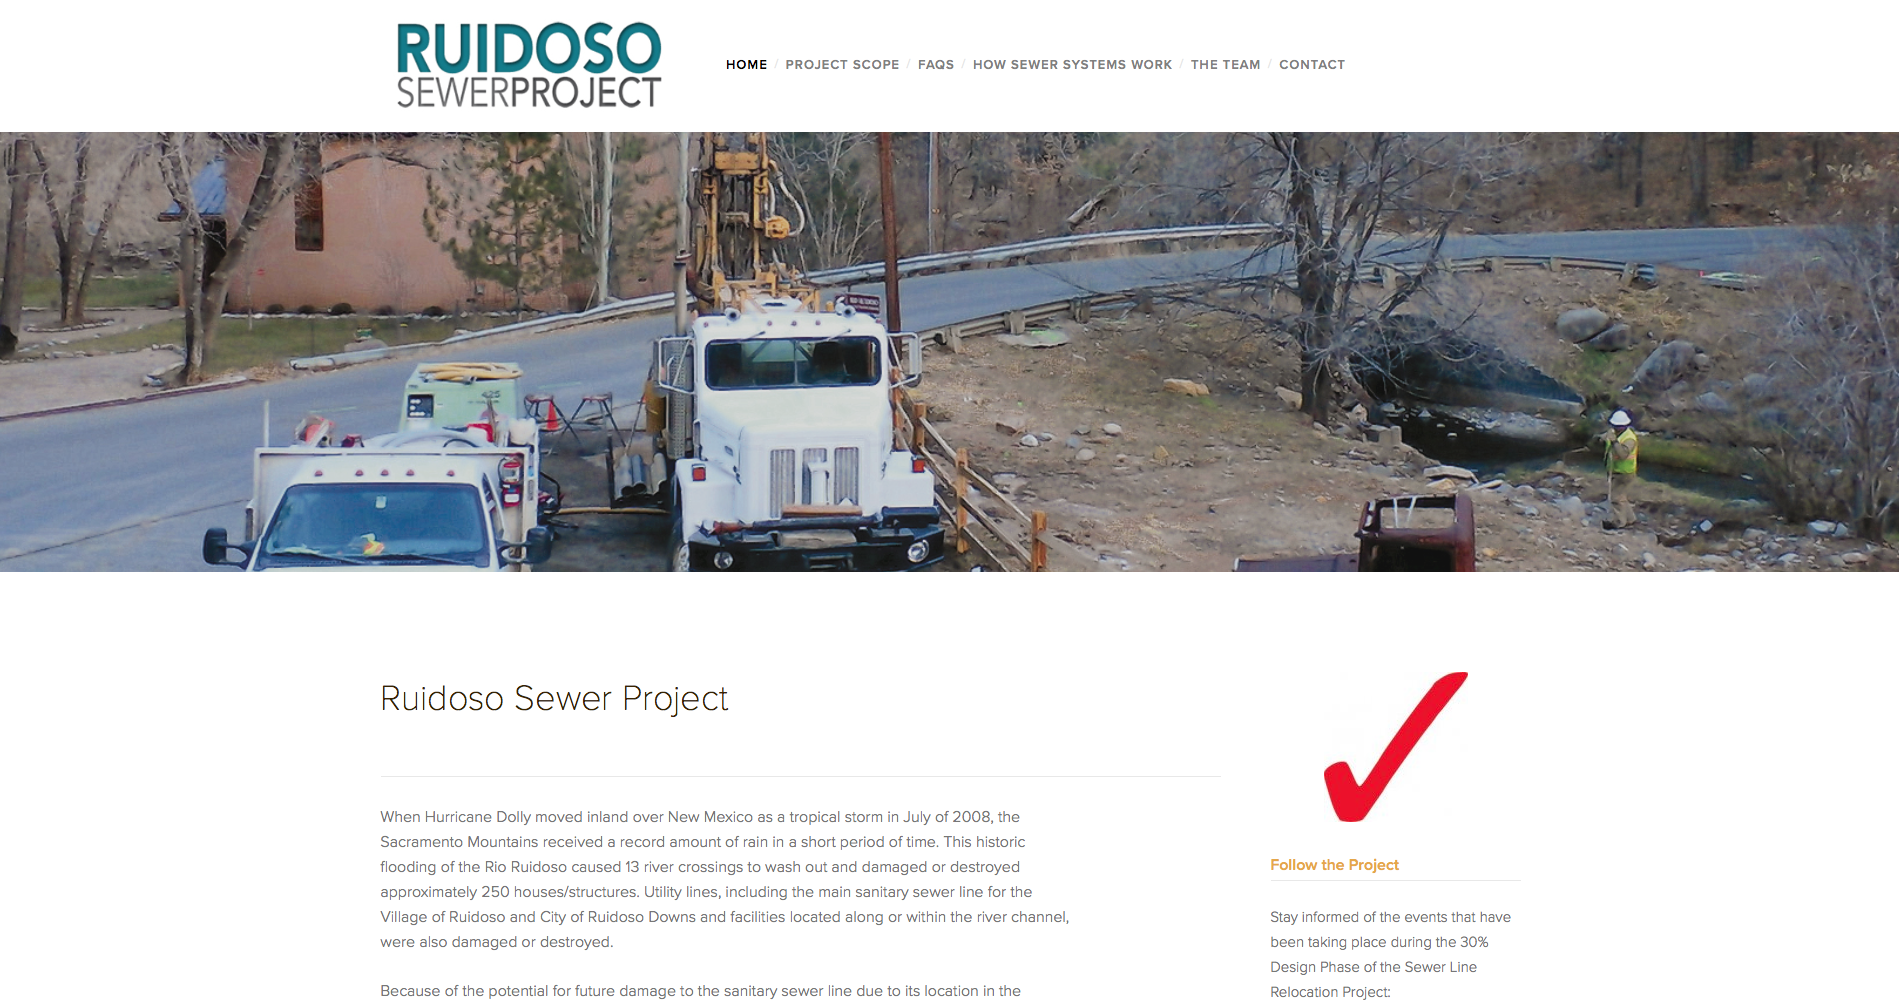 RuidosoSewerProject.com